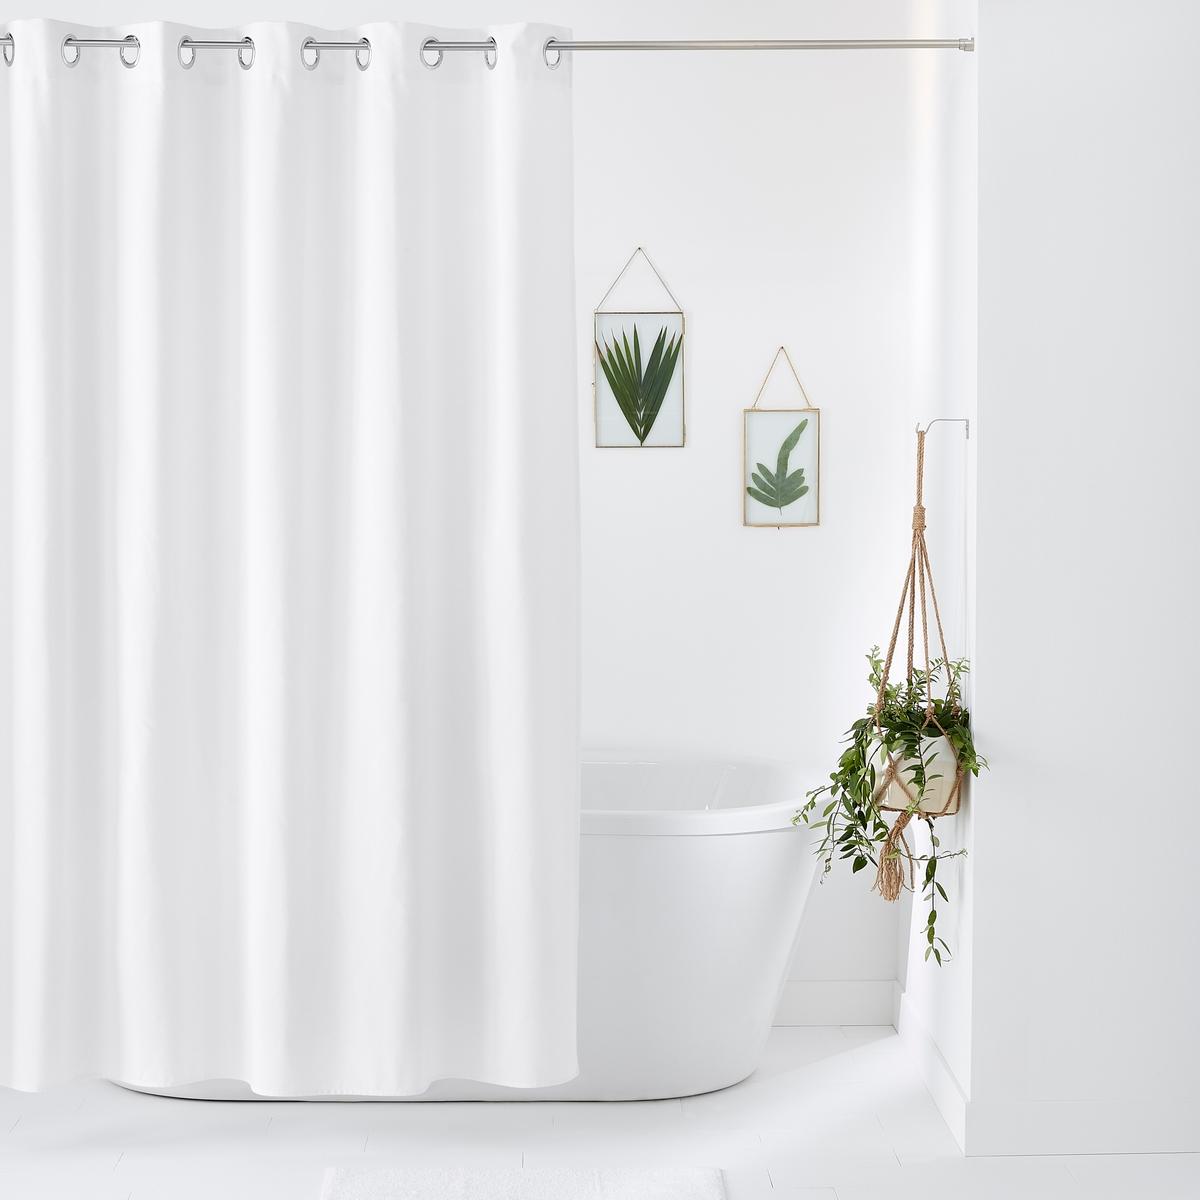 Штора для ванной комнаты  35389 от LaRedoute